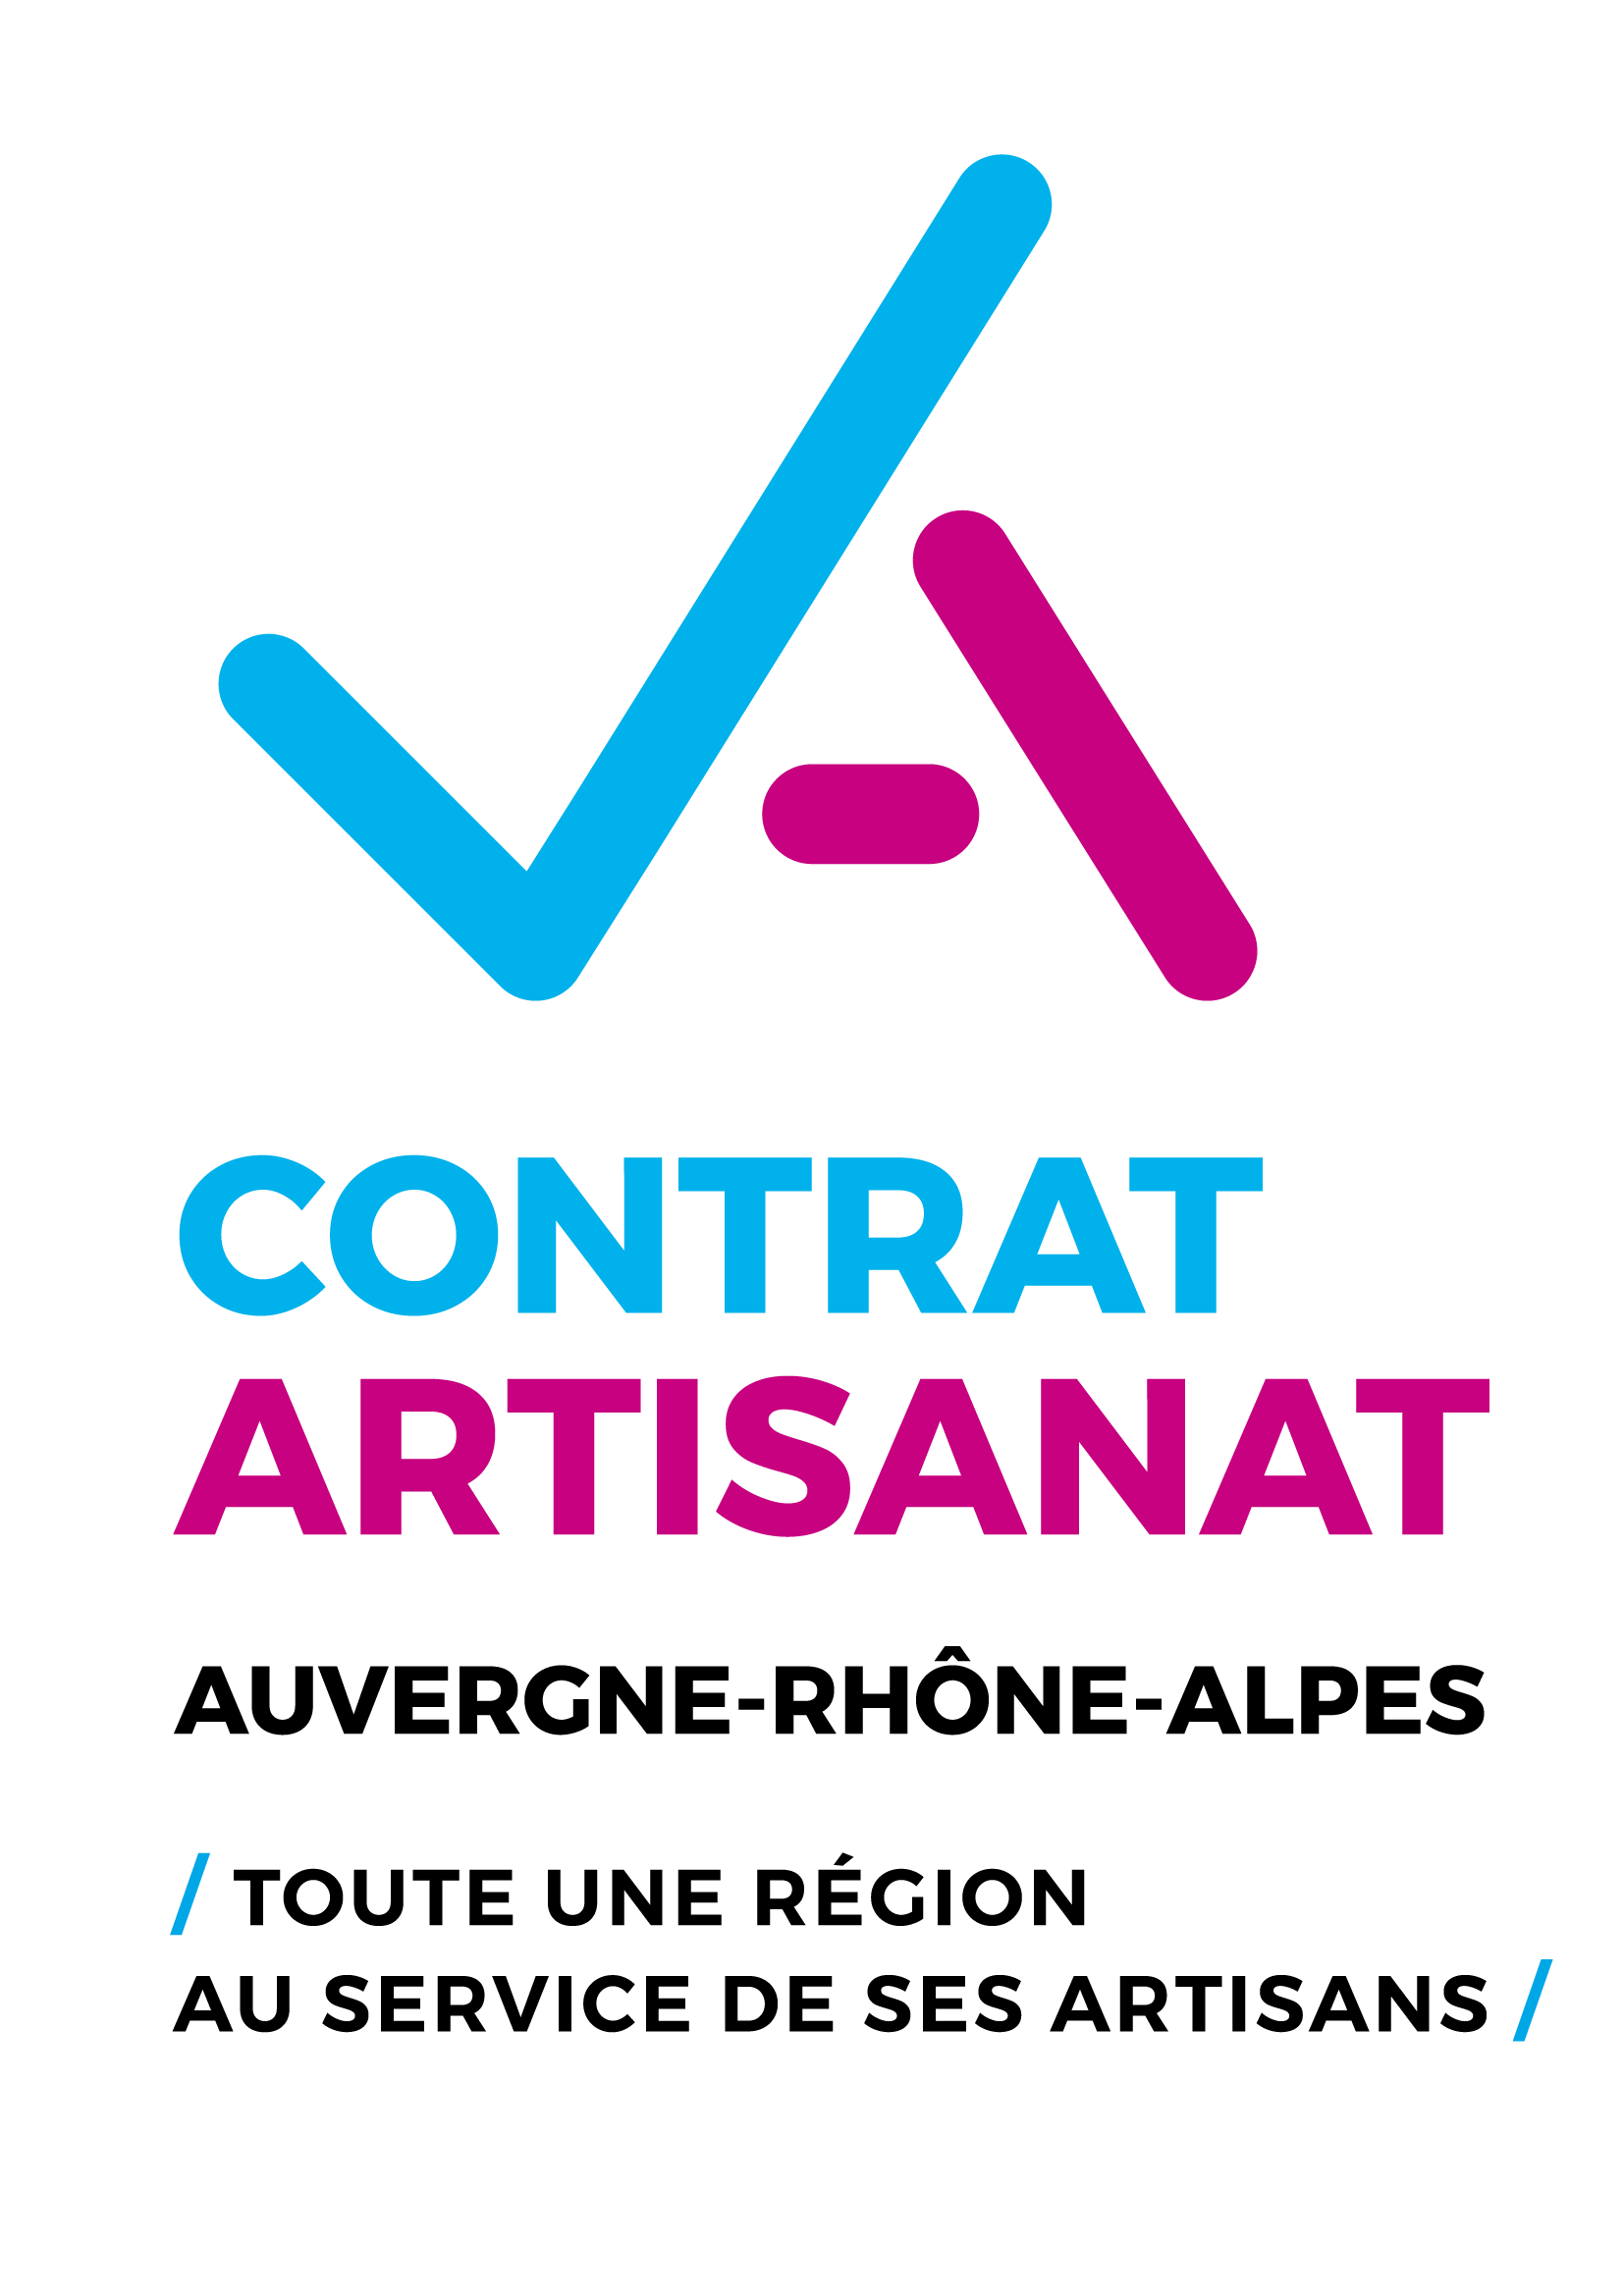 visuel_contrat_artisanat